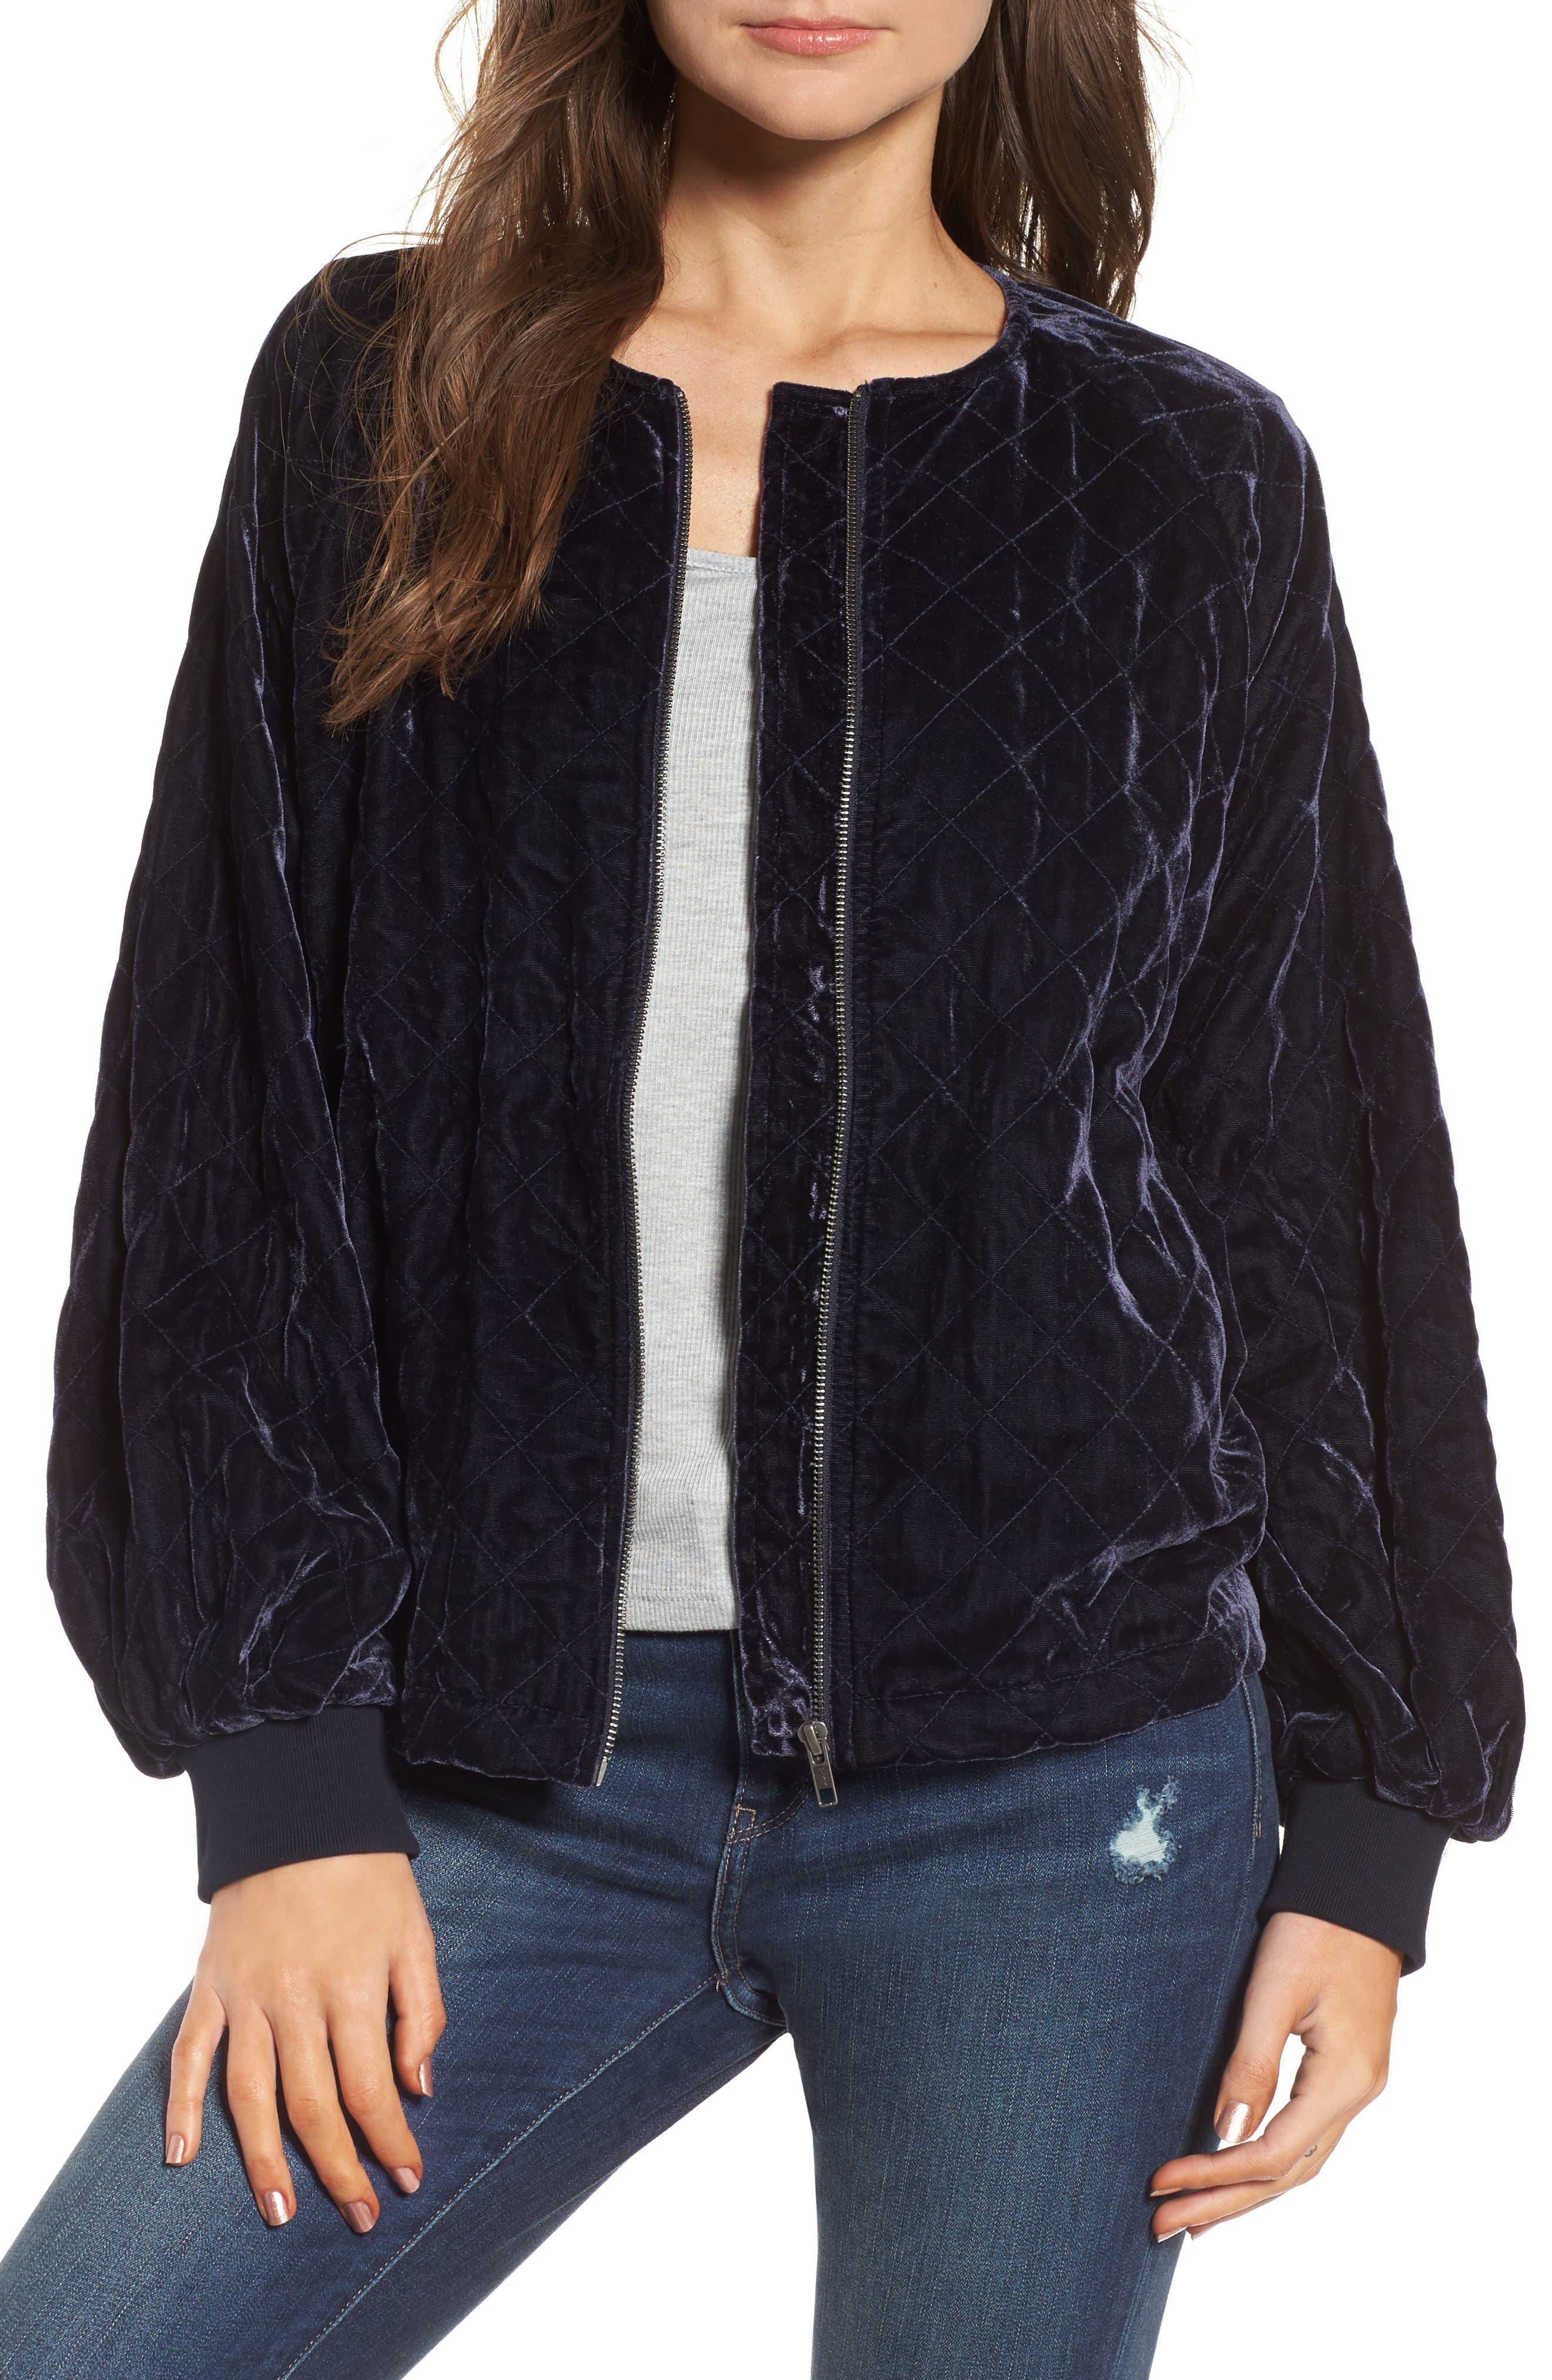 Alternate Image 1 Selected - Hinge Quilted Velvet Jacket